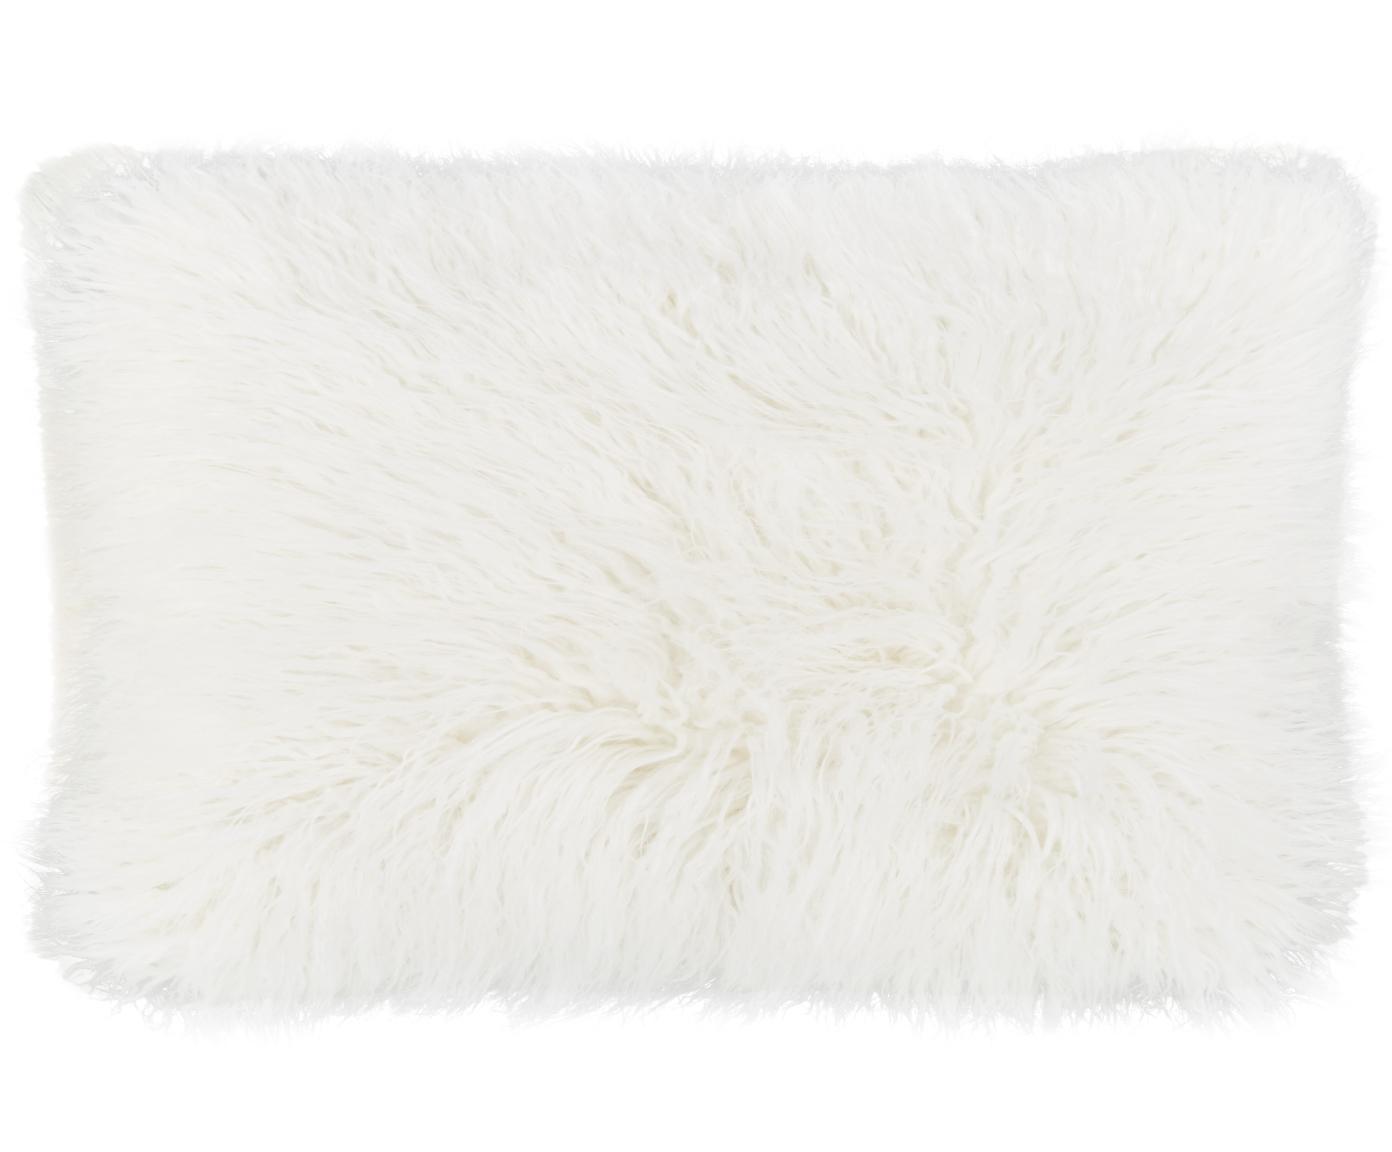 Poszewka na poduszkę ze sztucznego futra Morten, Kremowy, S 30 x D 50 cm